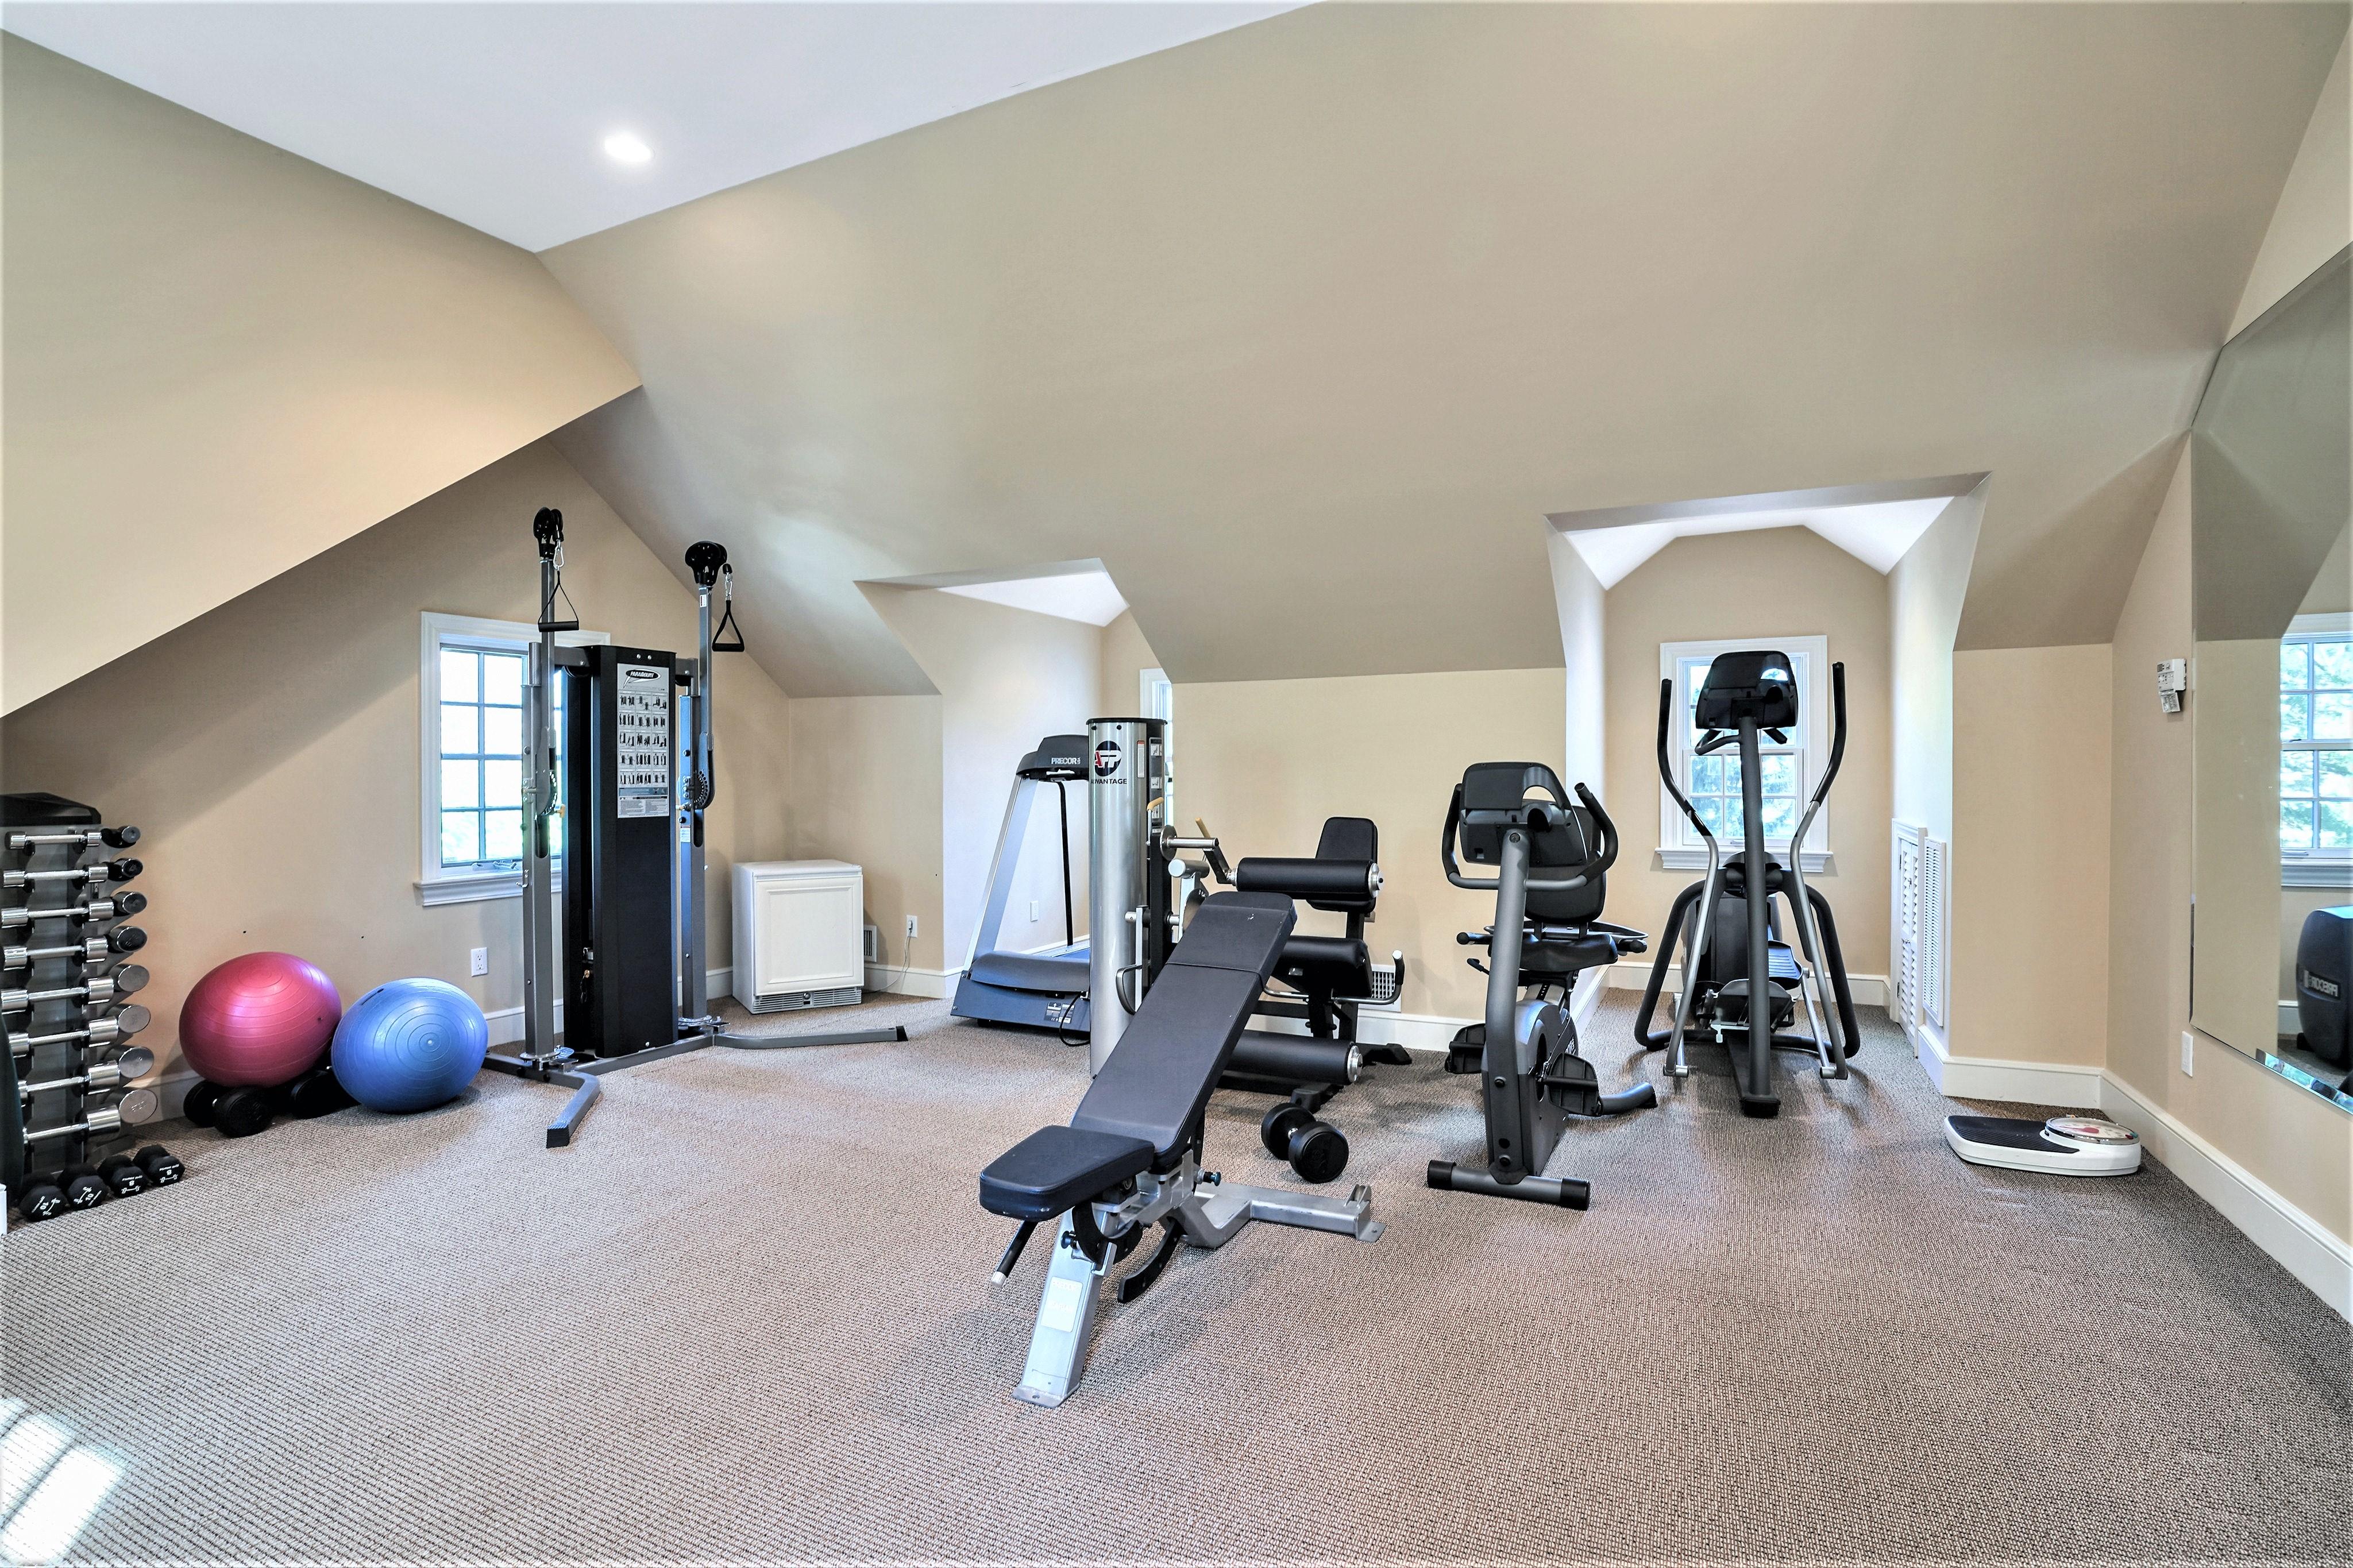 195 Highland Avenue Exercise Room